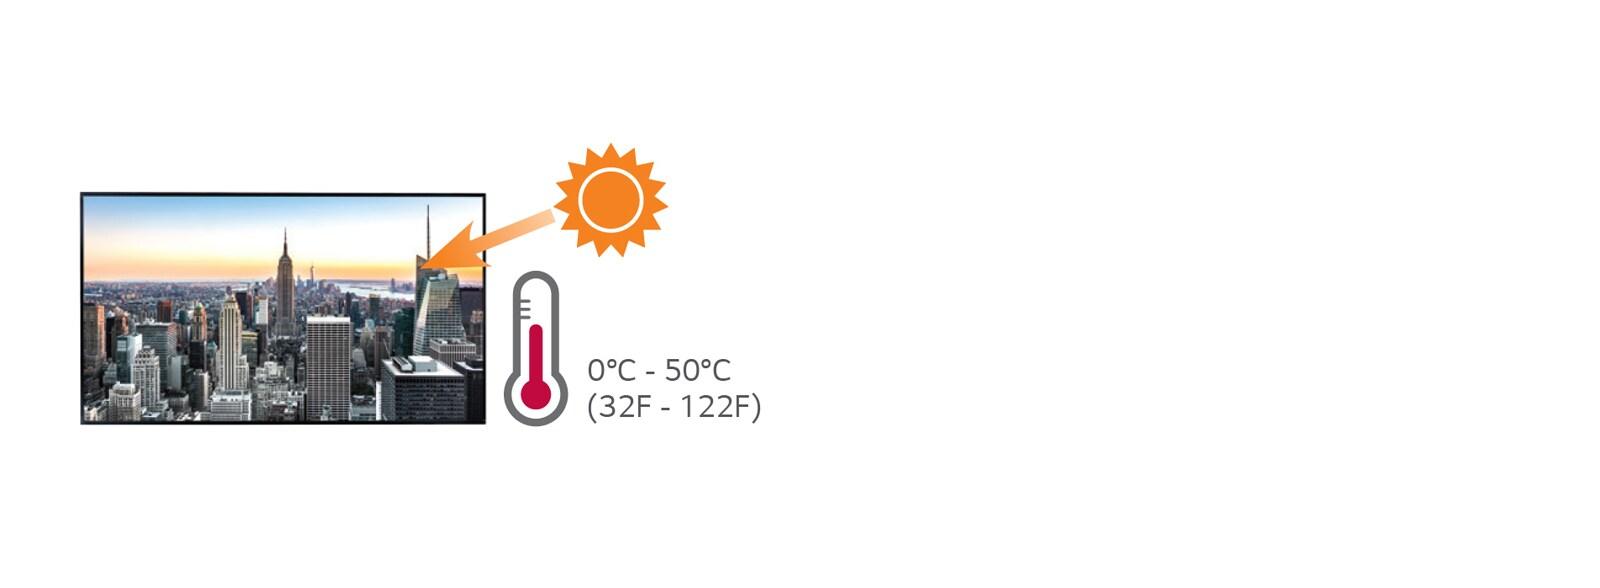 Hohe Betriebstemperatur